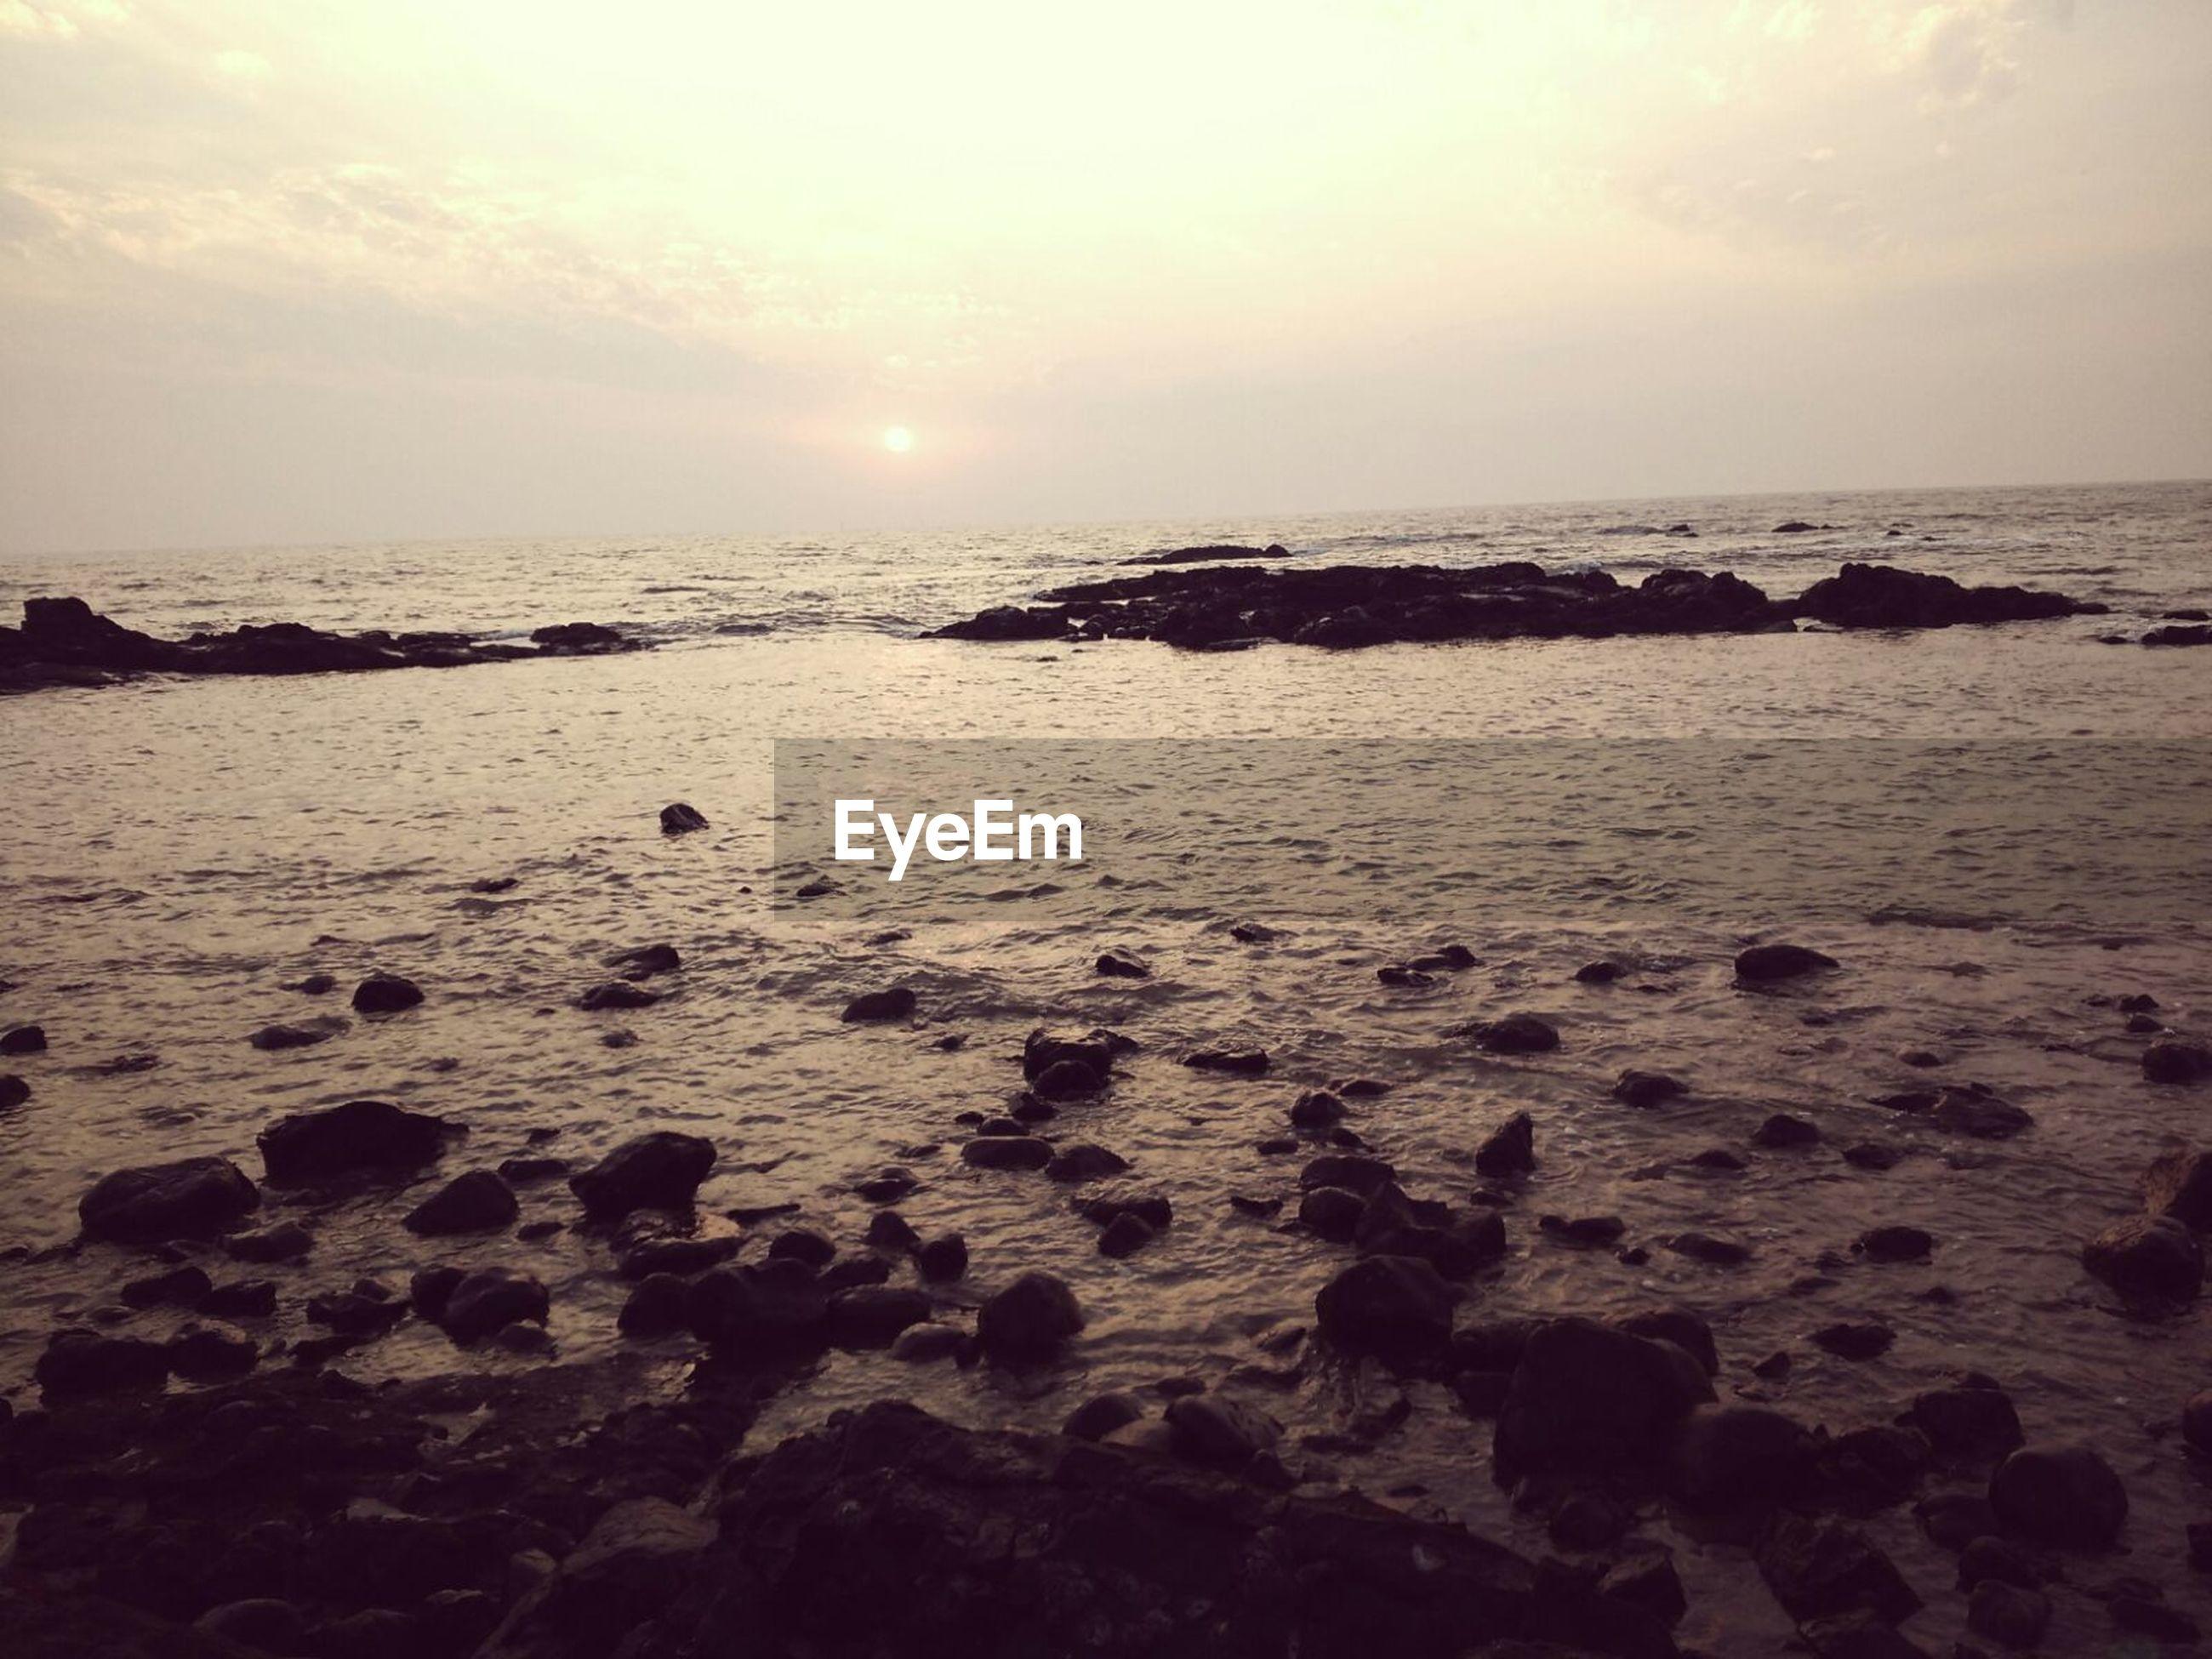 sea, horizon over water, beach, water, scenics, tranquil scene, shore, tranquility, sunset, beauty in nature, sky, nature, sun, idyllic, rock - object, wave, sand, sunlight, coastline, remote